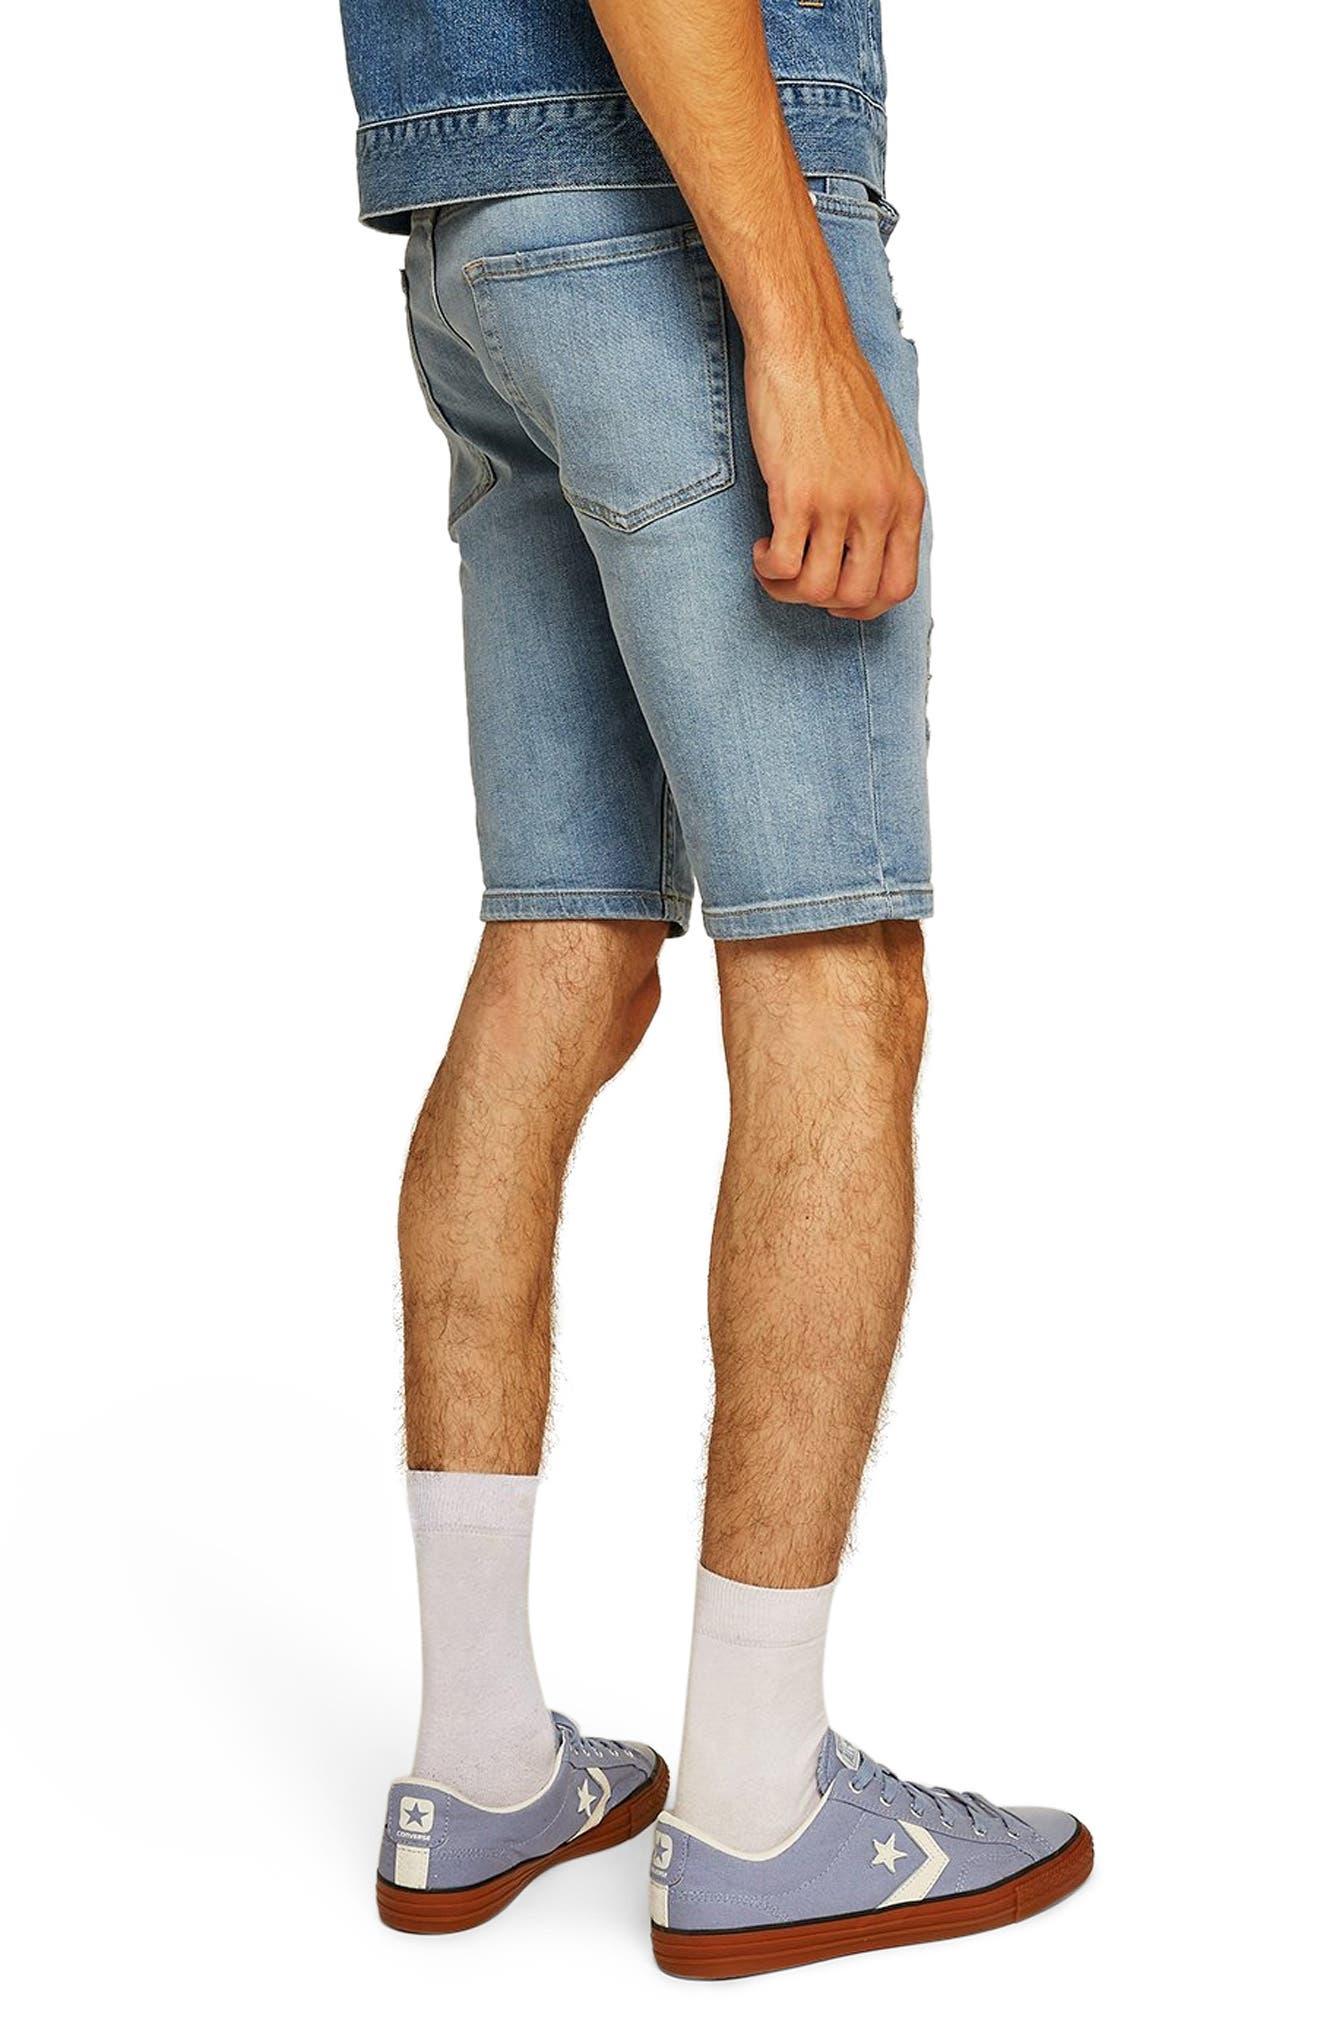 Bleach Ripped Skinny Denim Shorts,                             Alternate thumbnail 2, color,                             400